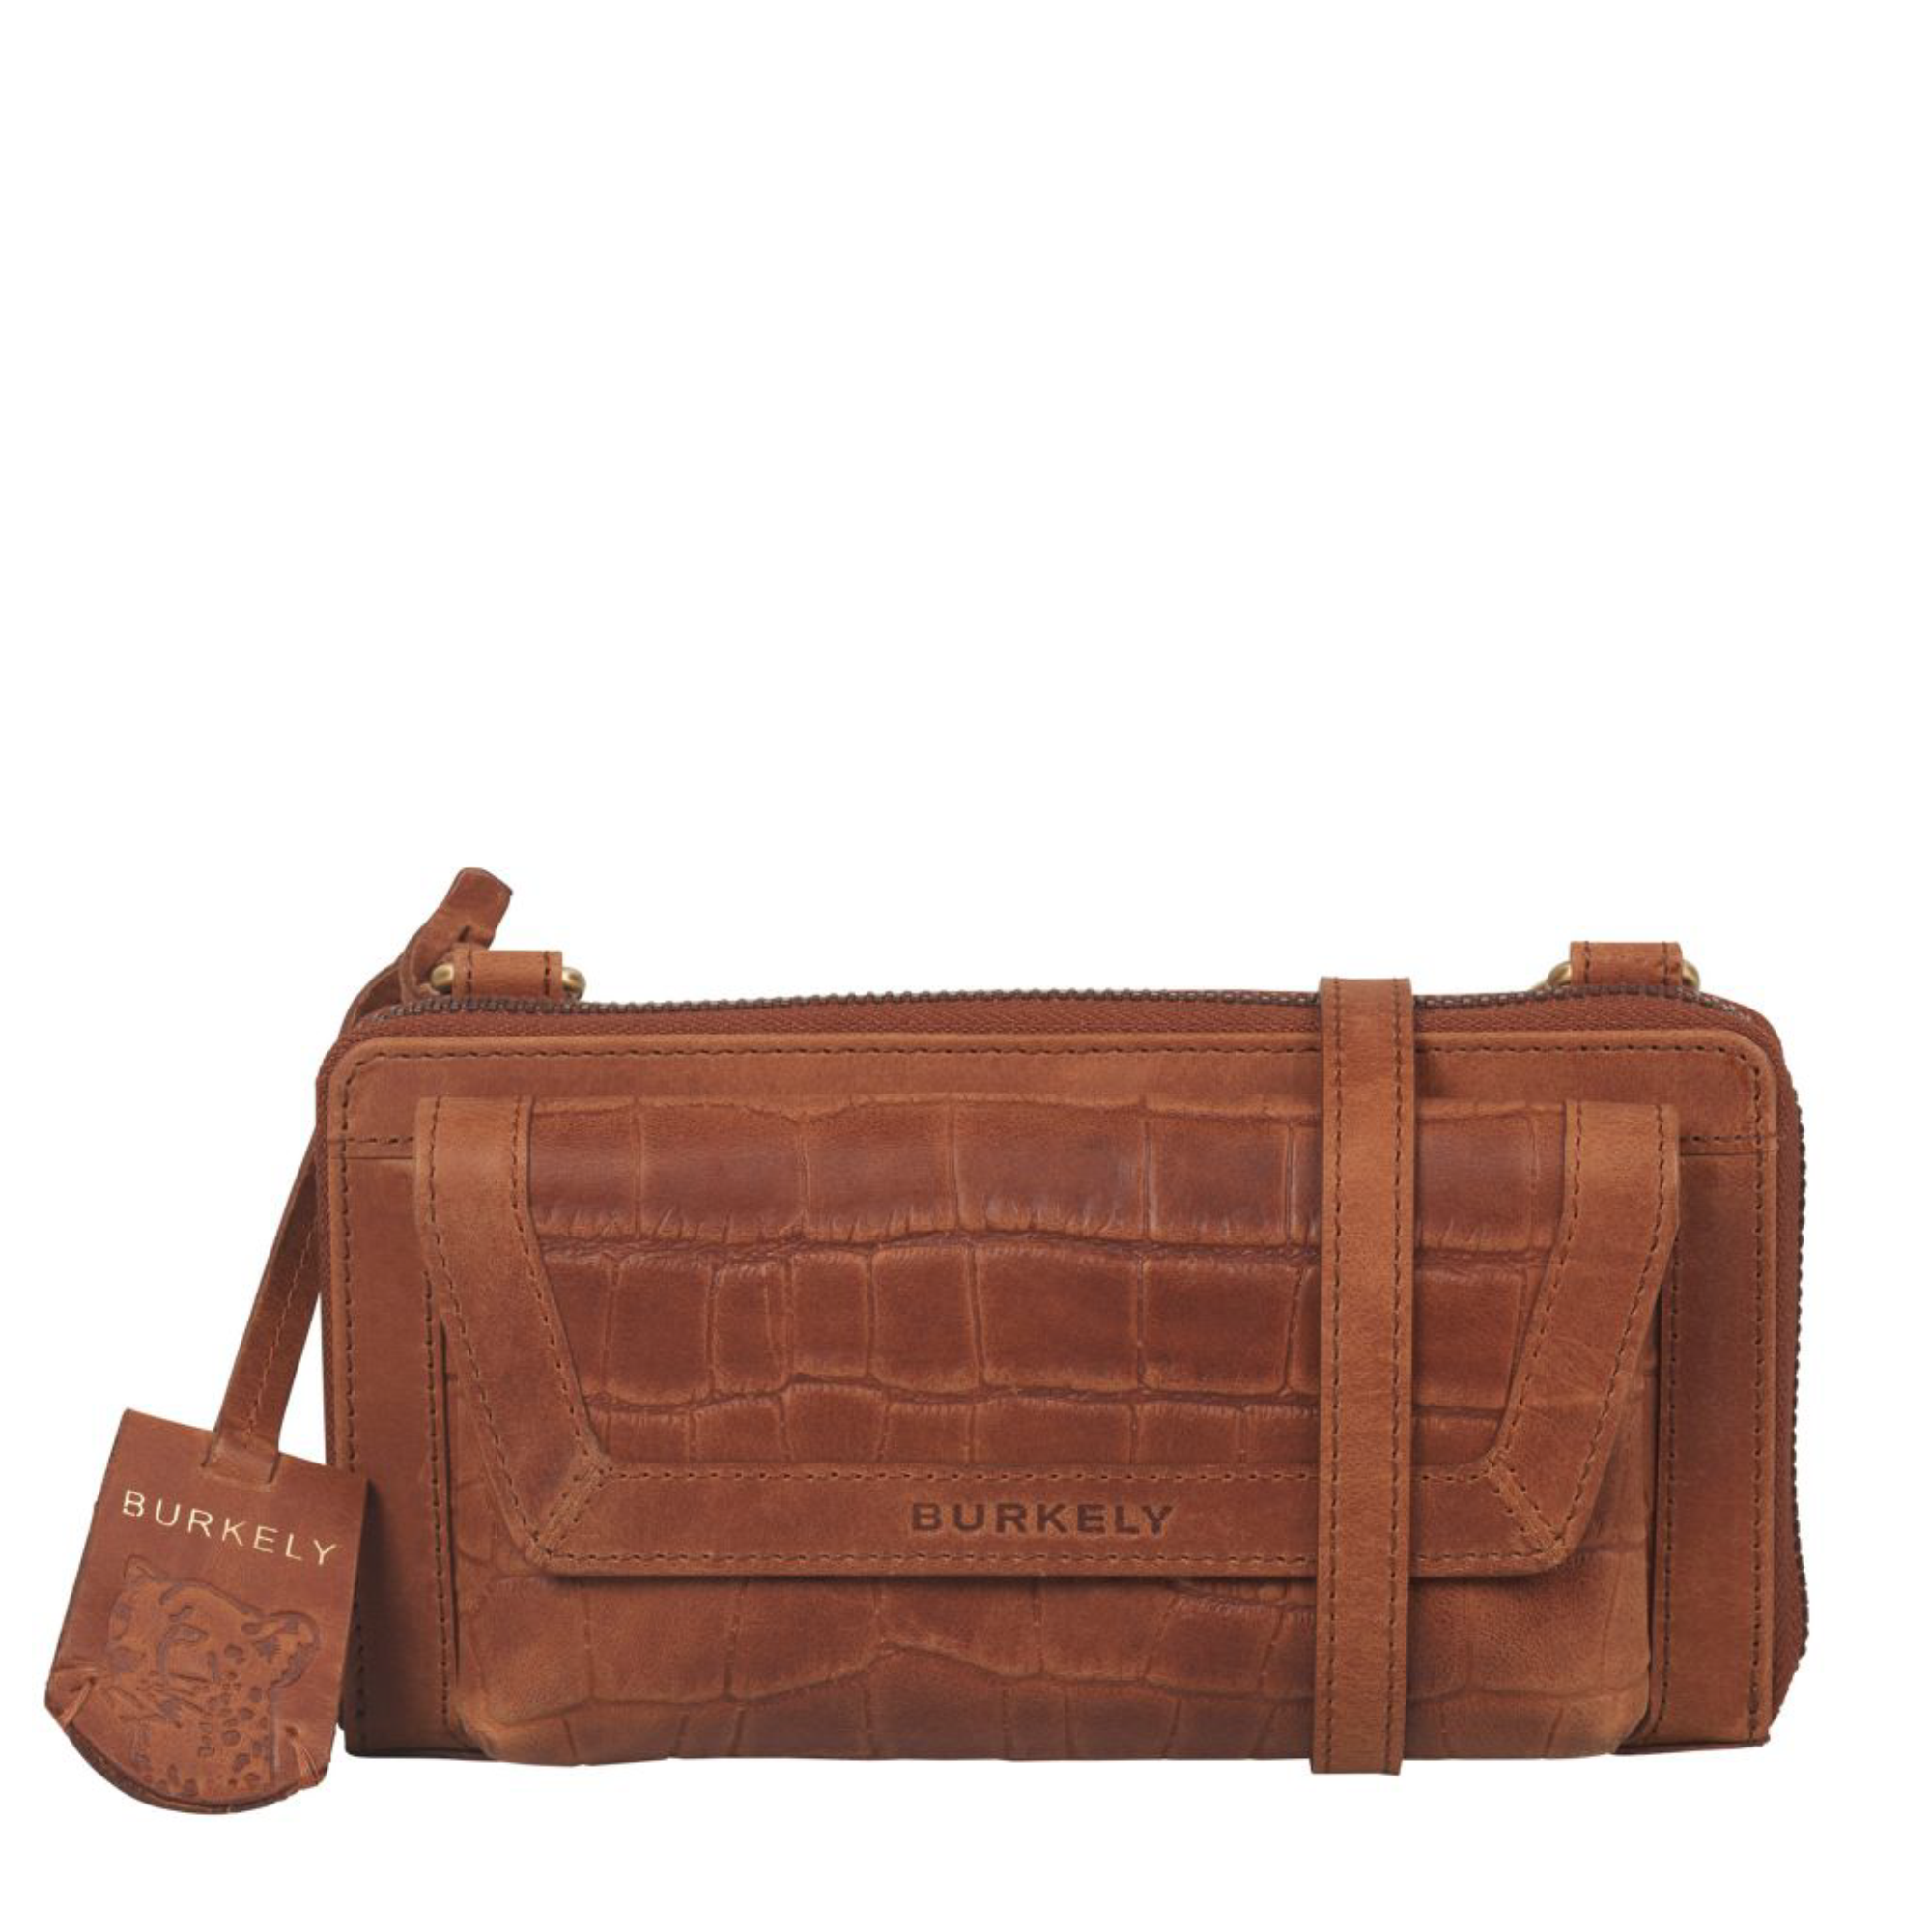 Burkely 1000129 Phone wallet 29.24 Cognac